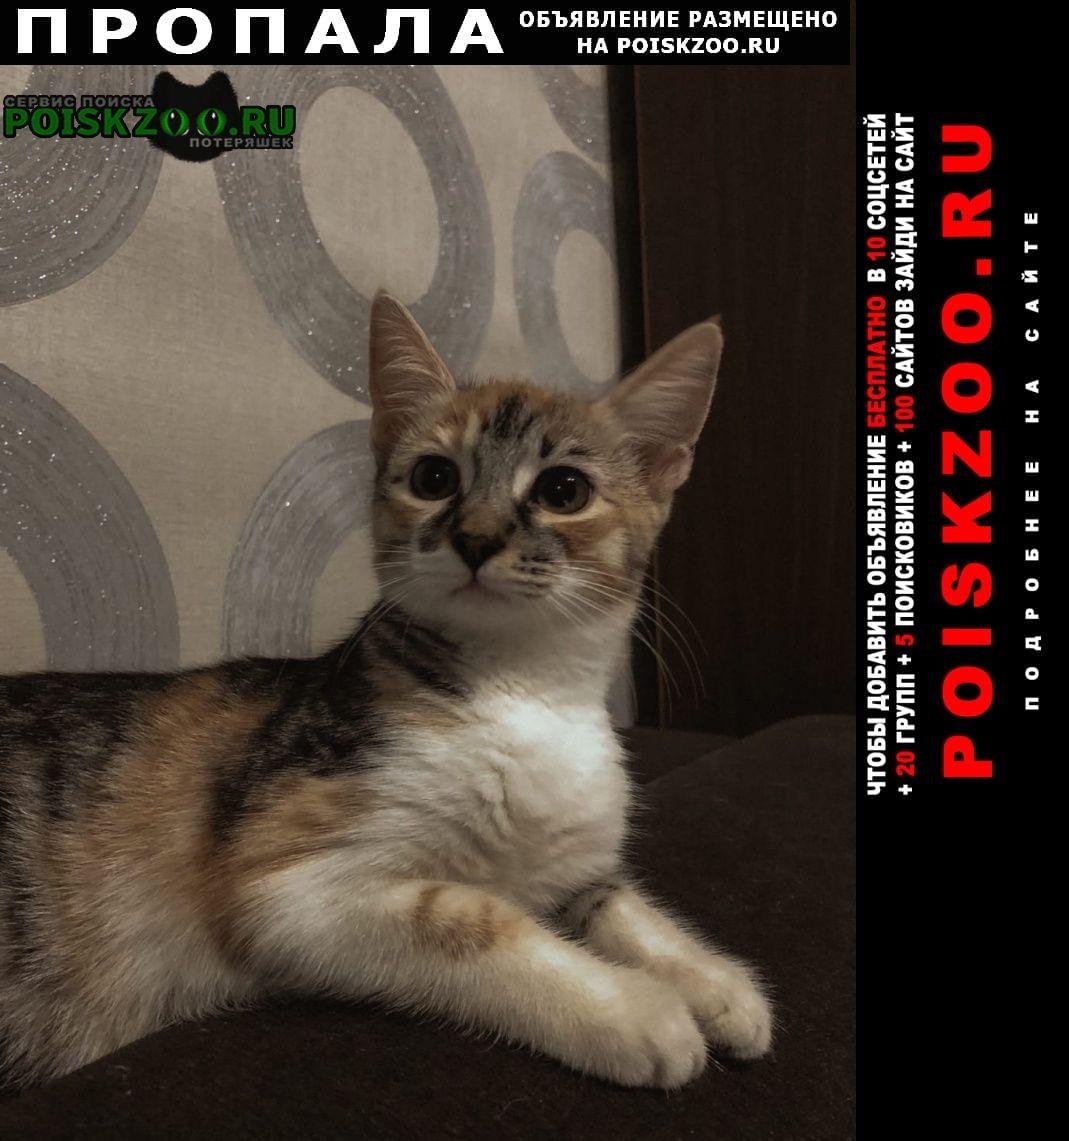 Пропала кошка по кличке боня. Москва